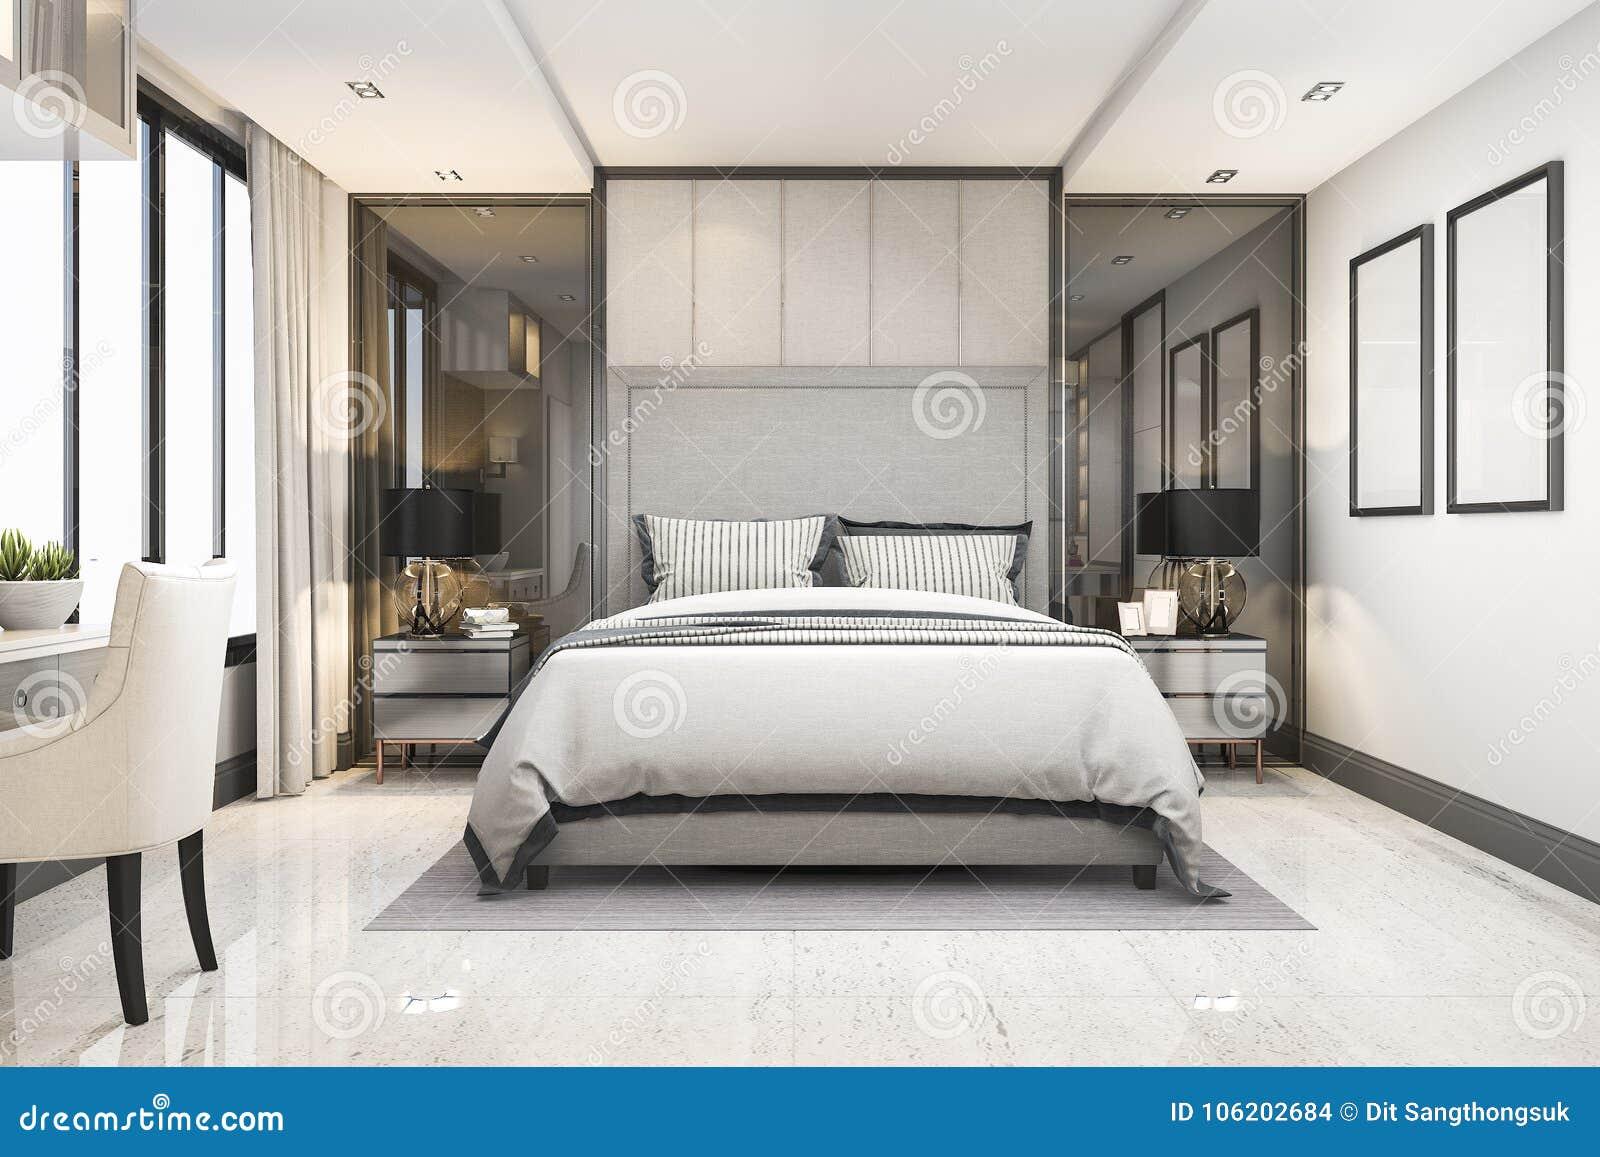 3d Rendering White Modern Luxury Bedroom Suite In Hotel With ...